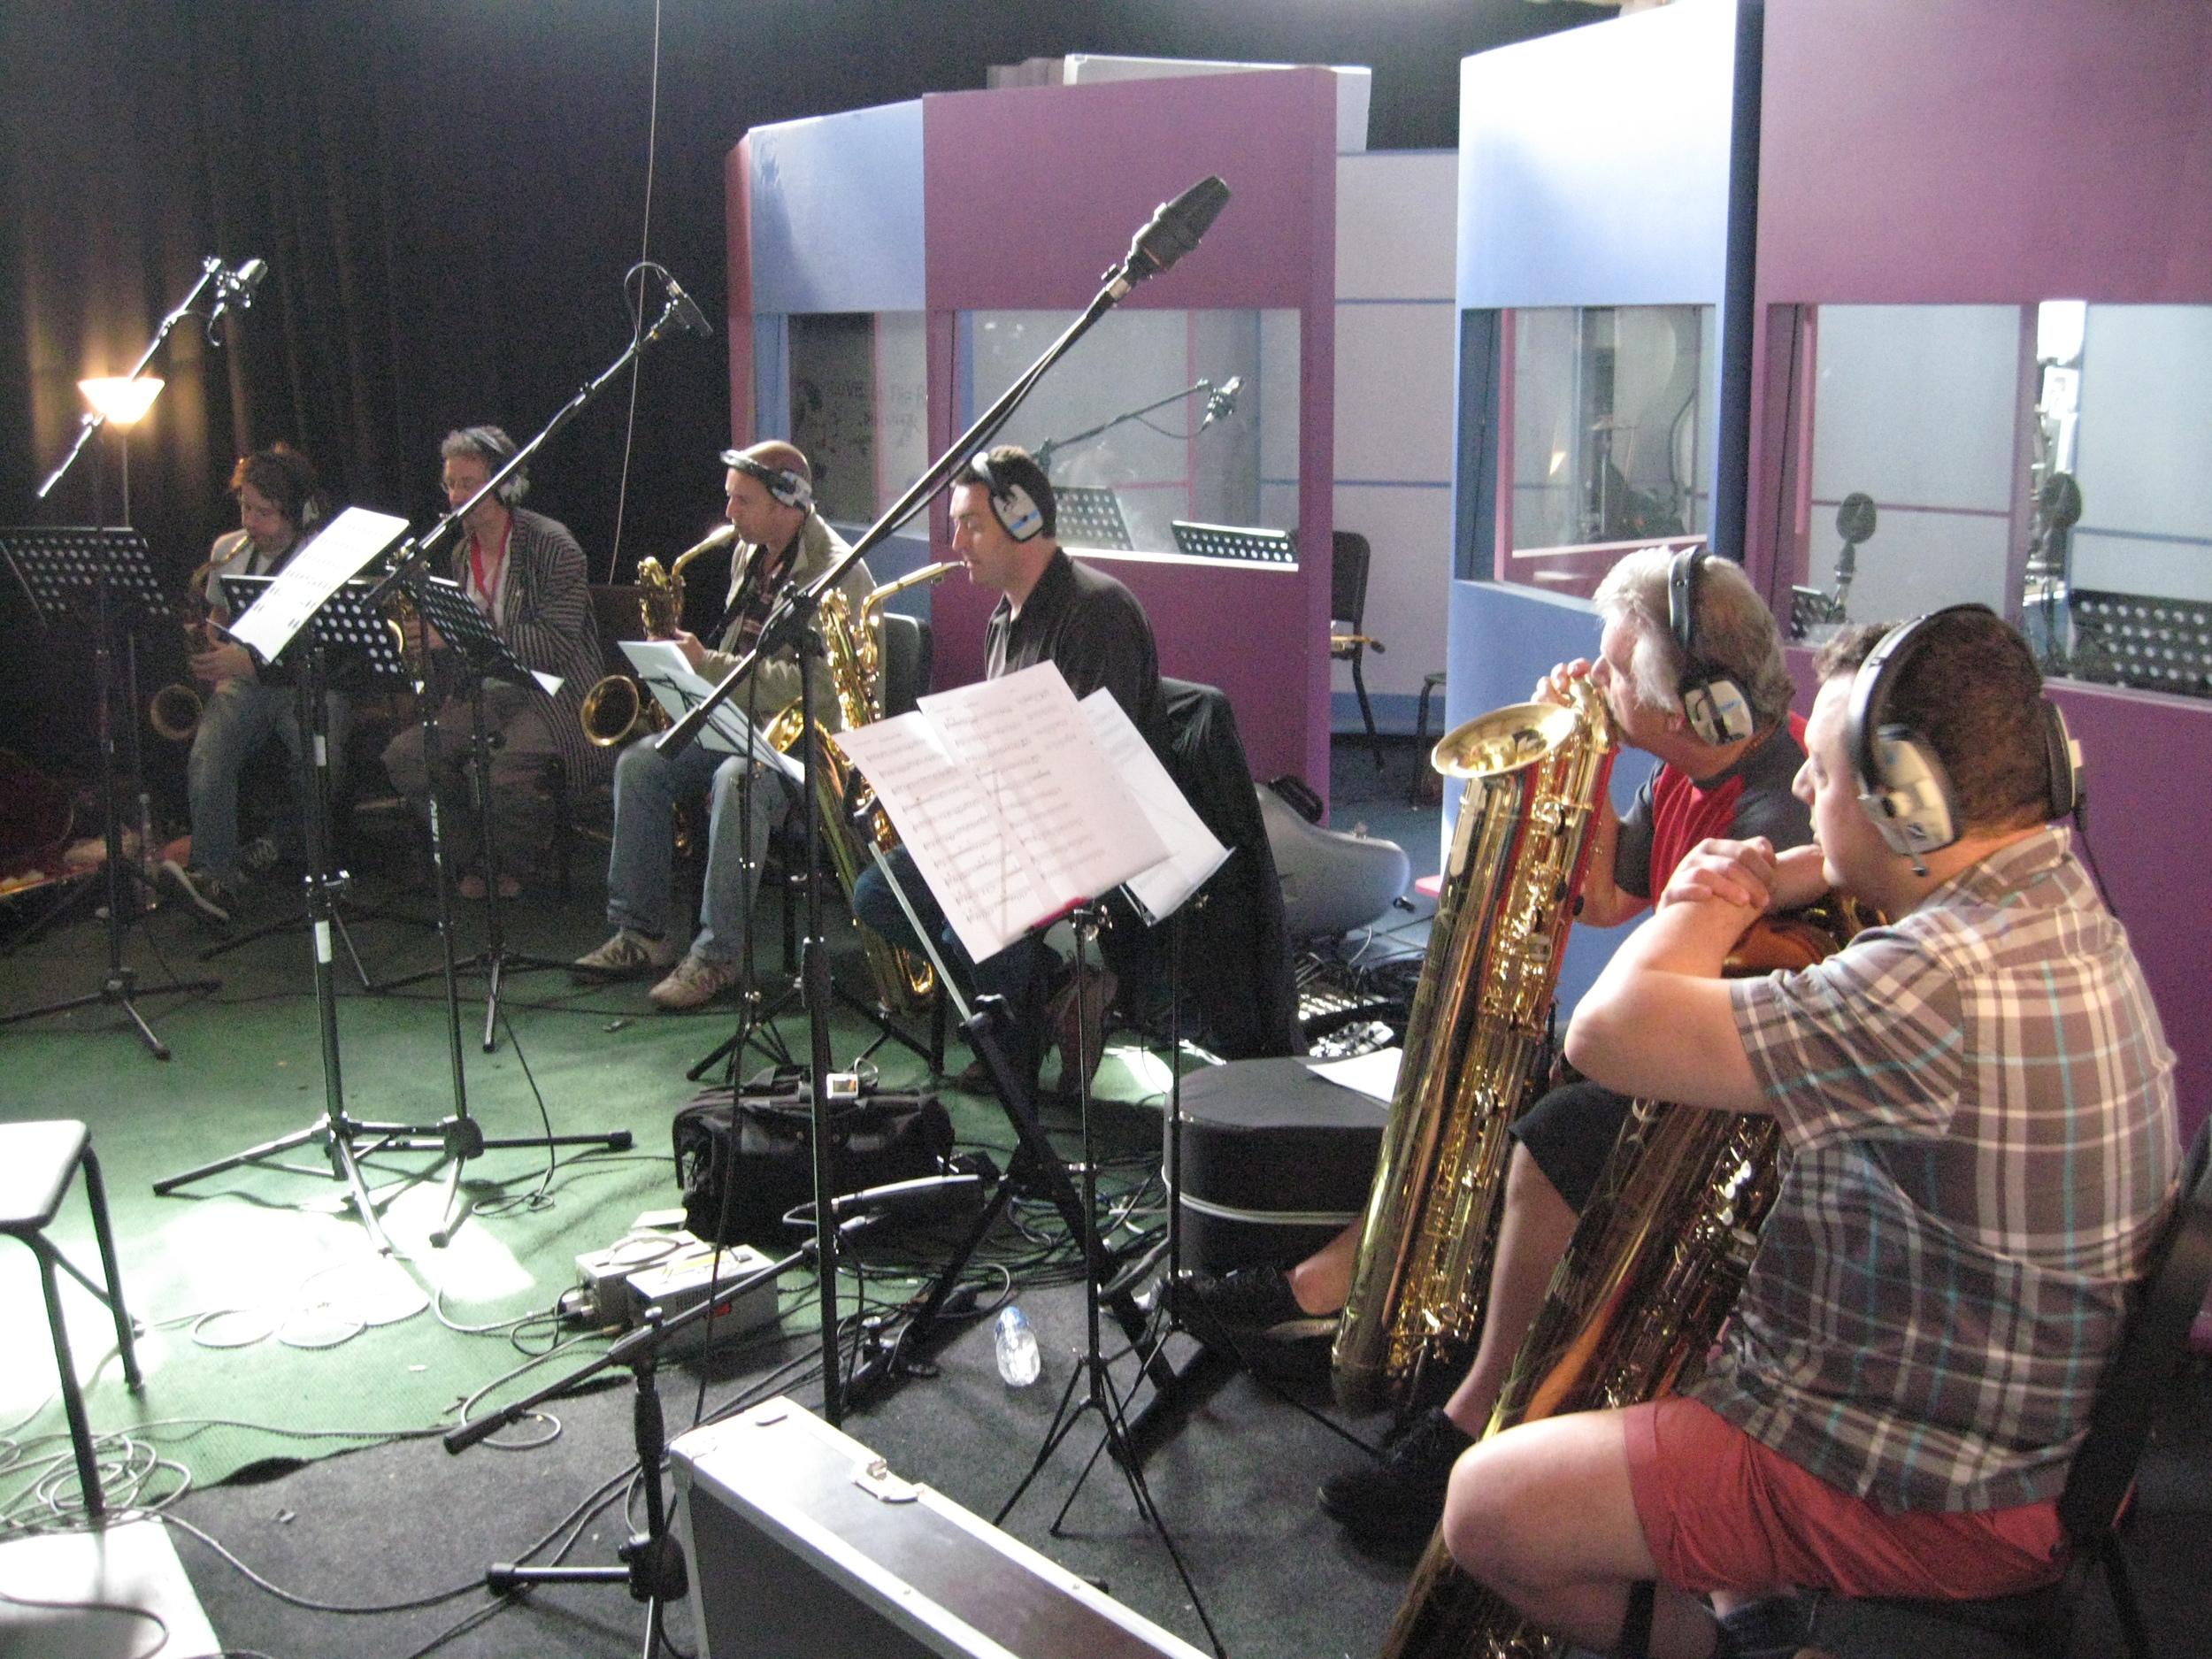 Guillemots Red Album, 2007  Ben Castle, Dai Pritchard, MW, Dave Bishop, Phil Todd, Pete Long